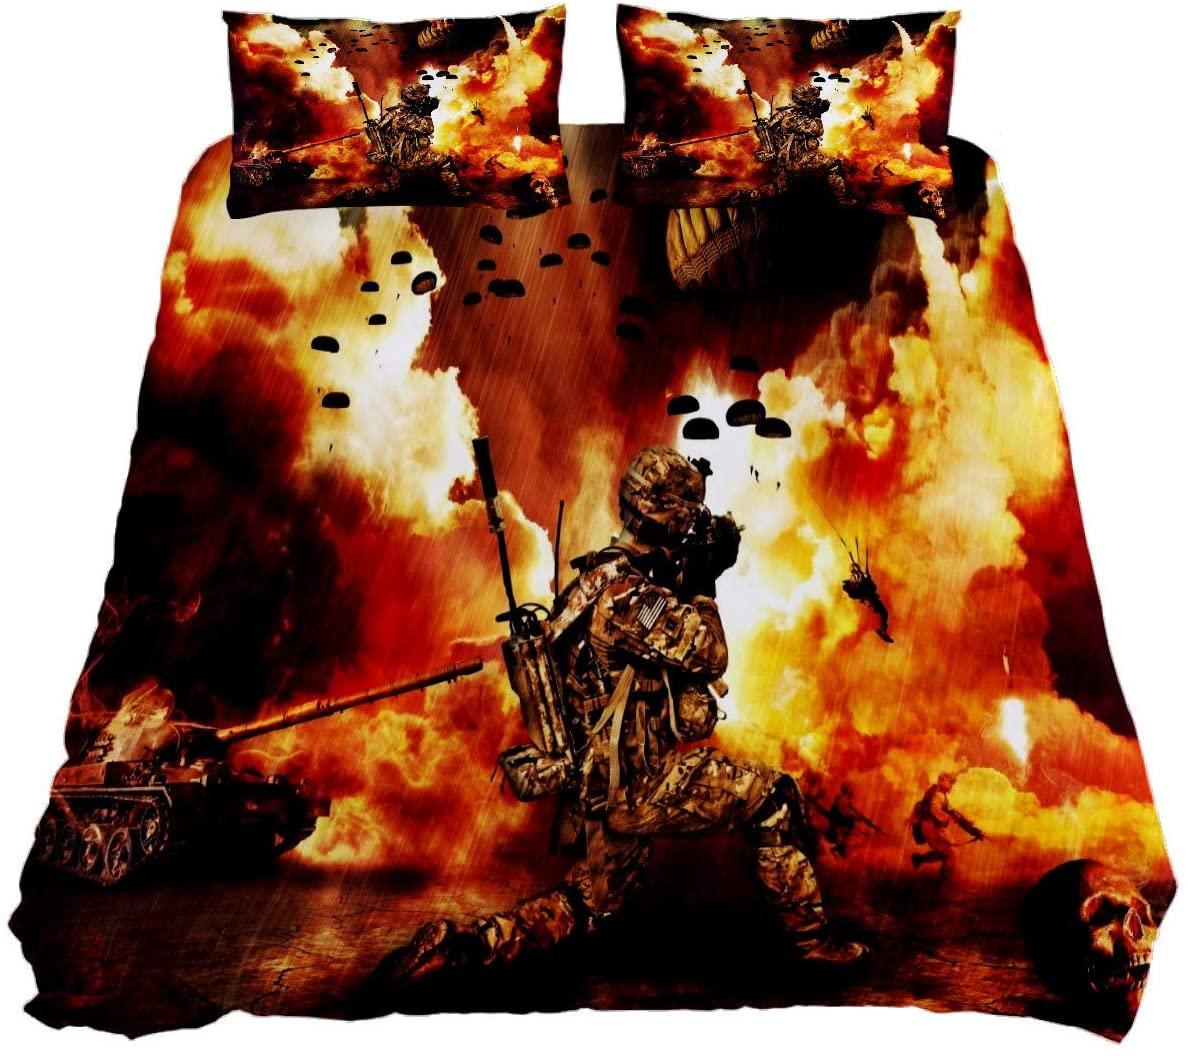 N\O War Venue Bedding Duvet Cover Set Kids Bed Sheet Set Twin 3 Pieces Full Size with Zipper Ties Quilt (1 Duvet Cover + 2 Pillow Shams) Bedclothes for Teen Women Men